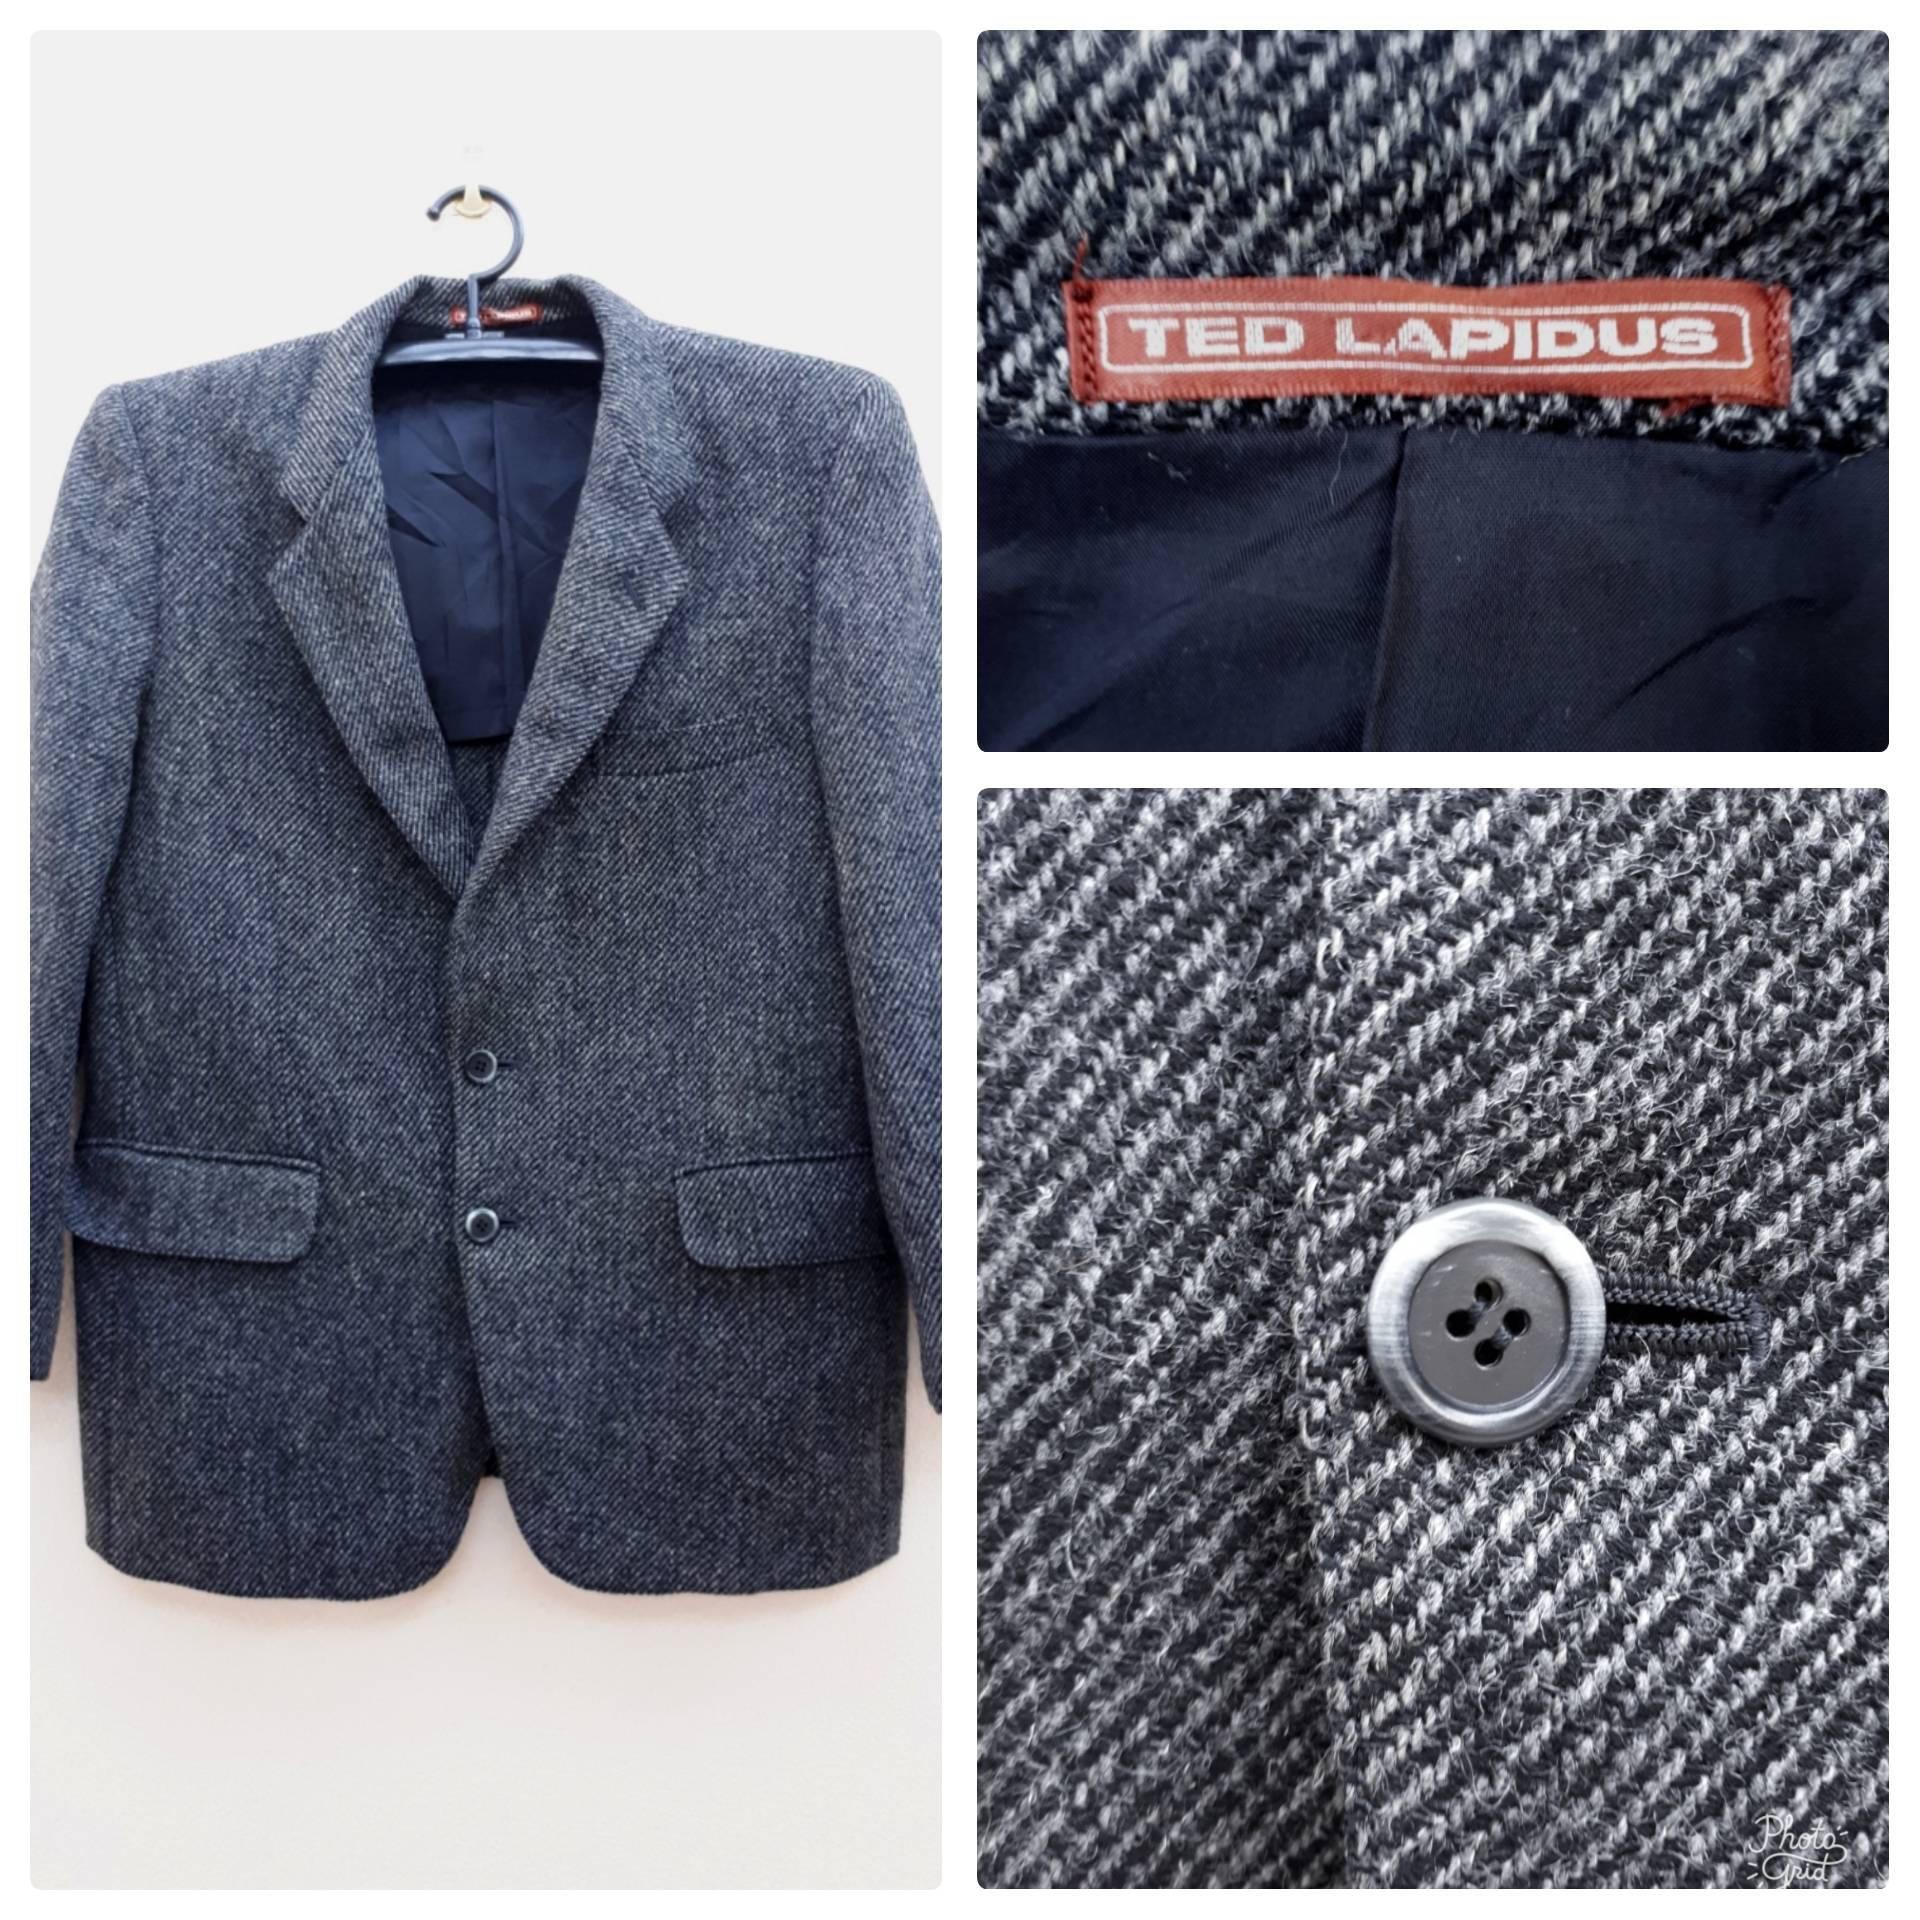 1950s Mens Suits & Sport Coats | 50s Suits & Blazers Mens Suit Jacket - Designer Ted Lapidus 1950S-Inspired Gangster Look Wool Sport CoatBlazer Mens Jacket Size S M $20.00 AT vintagedancer.com